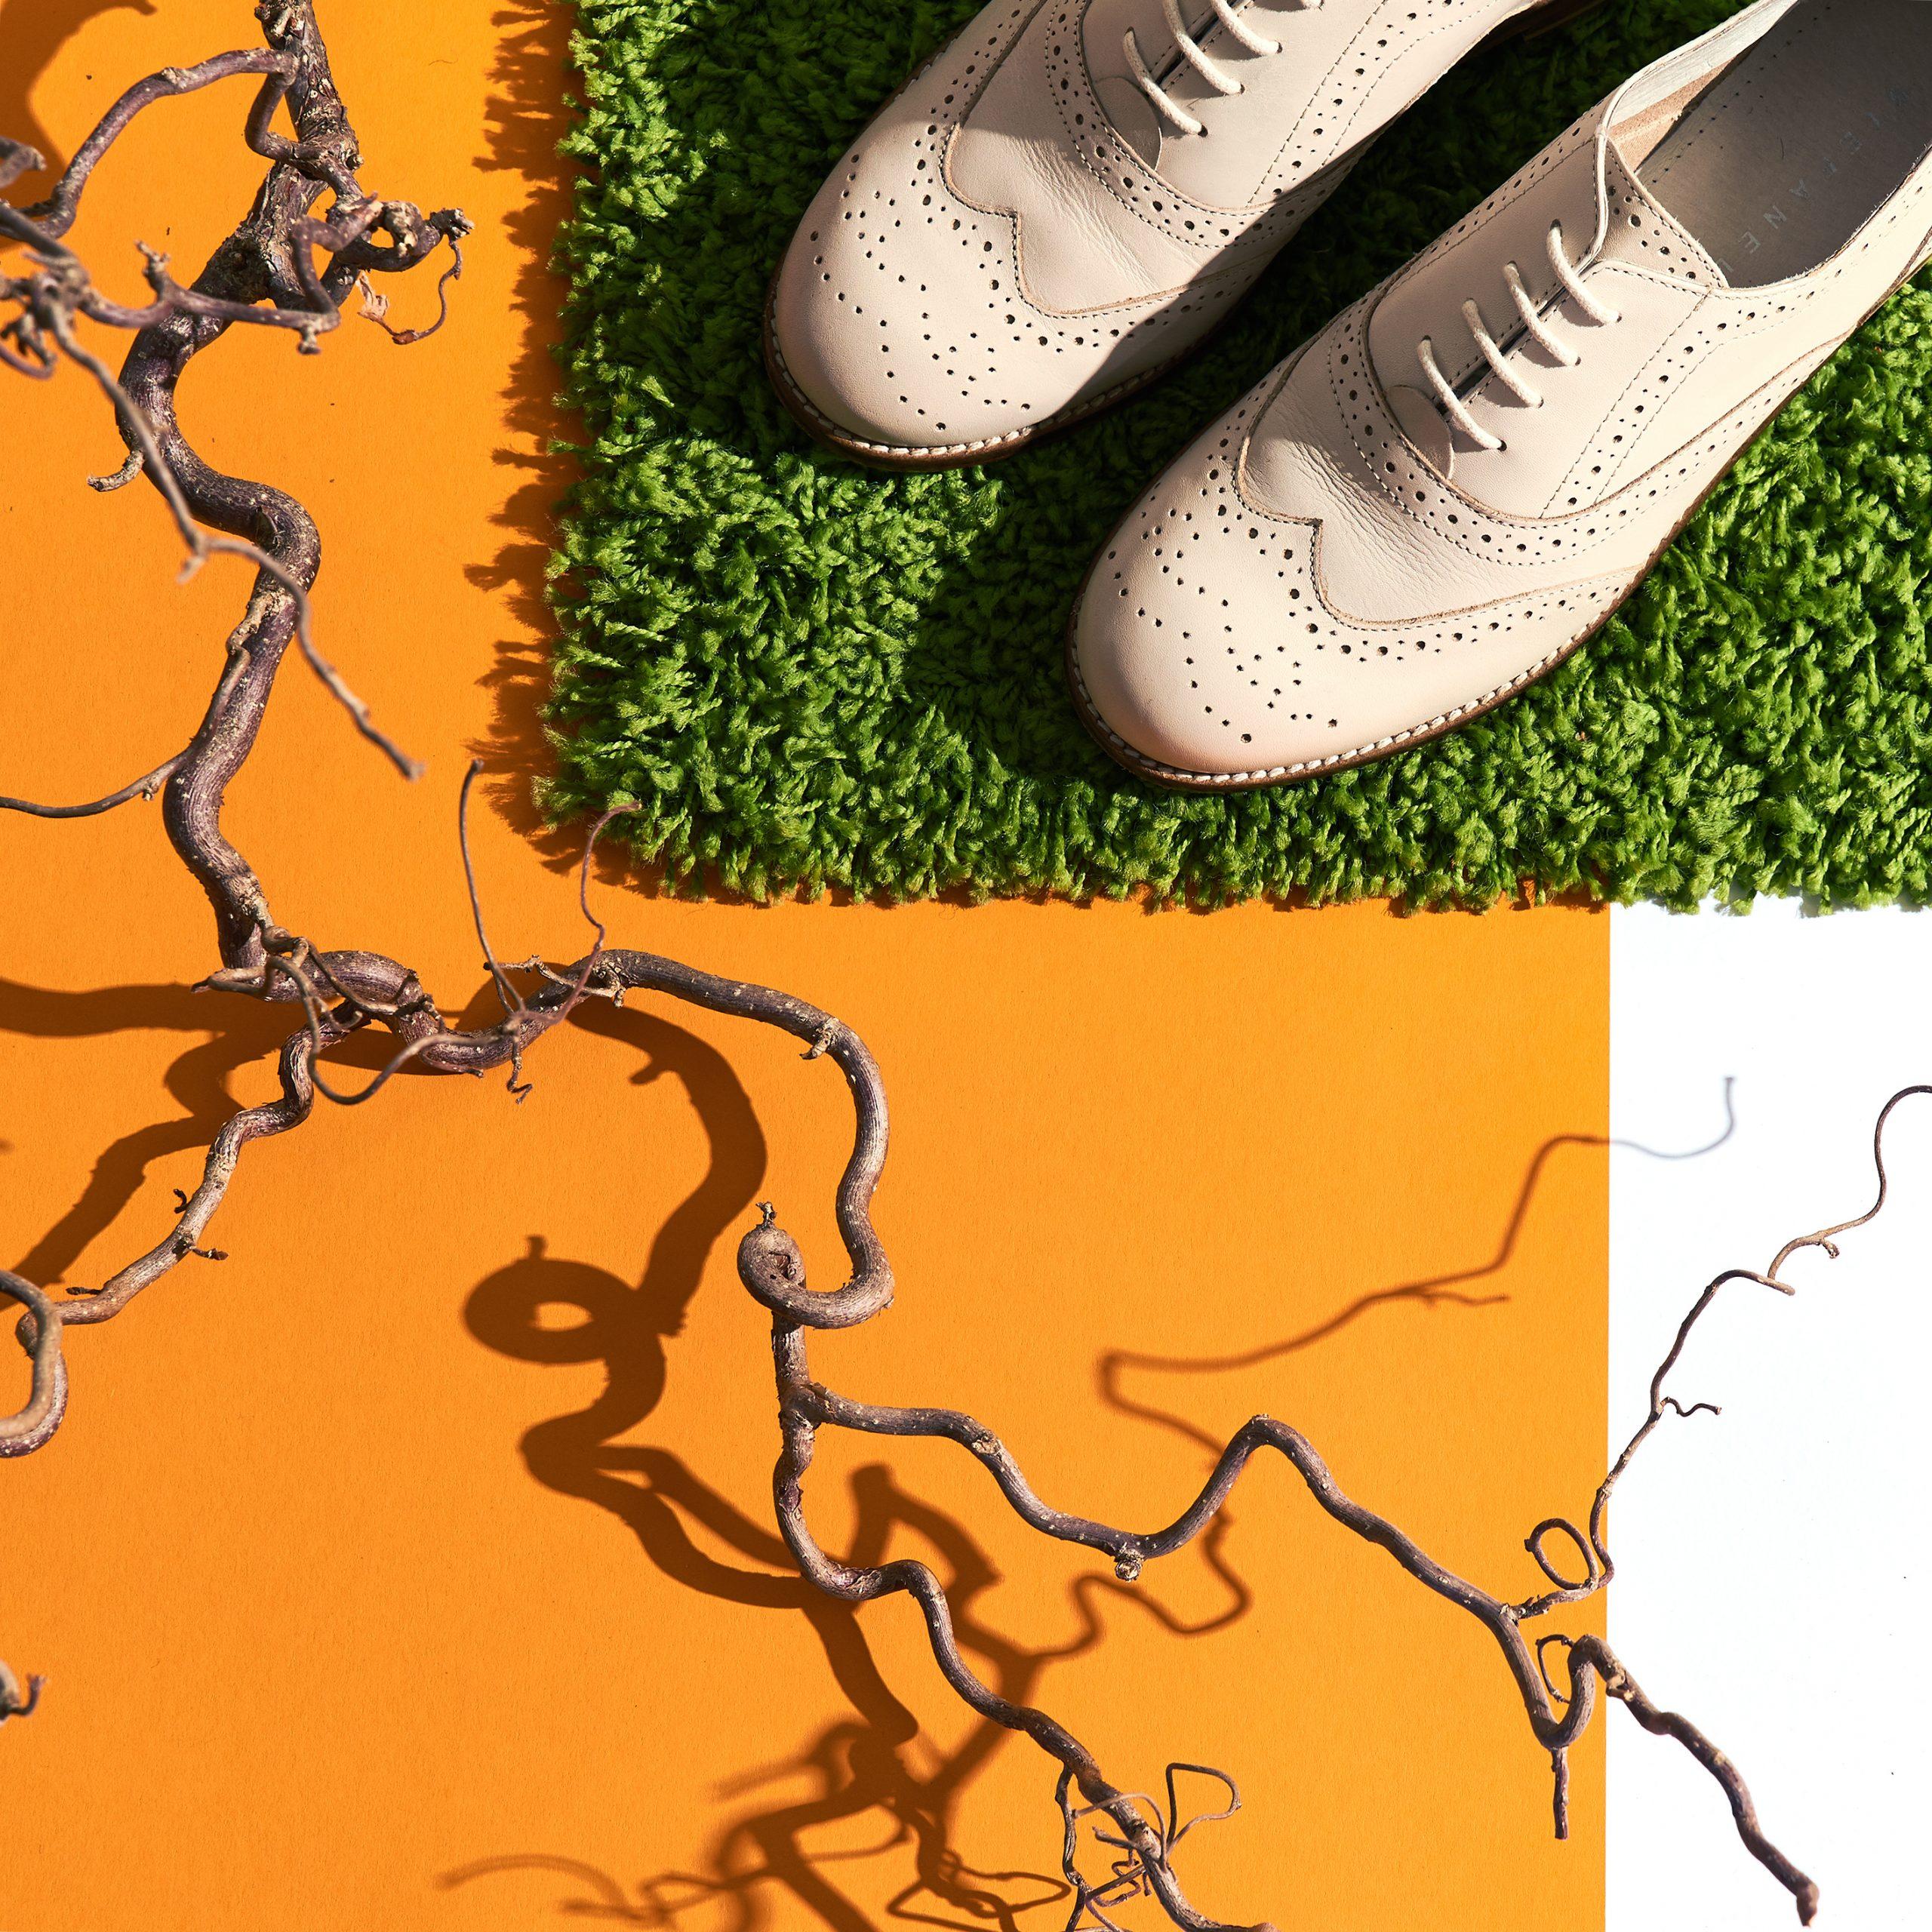 Produktfotografie Schuhe straubmuellerstudios